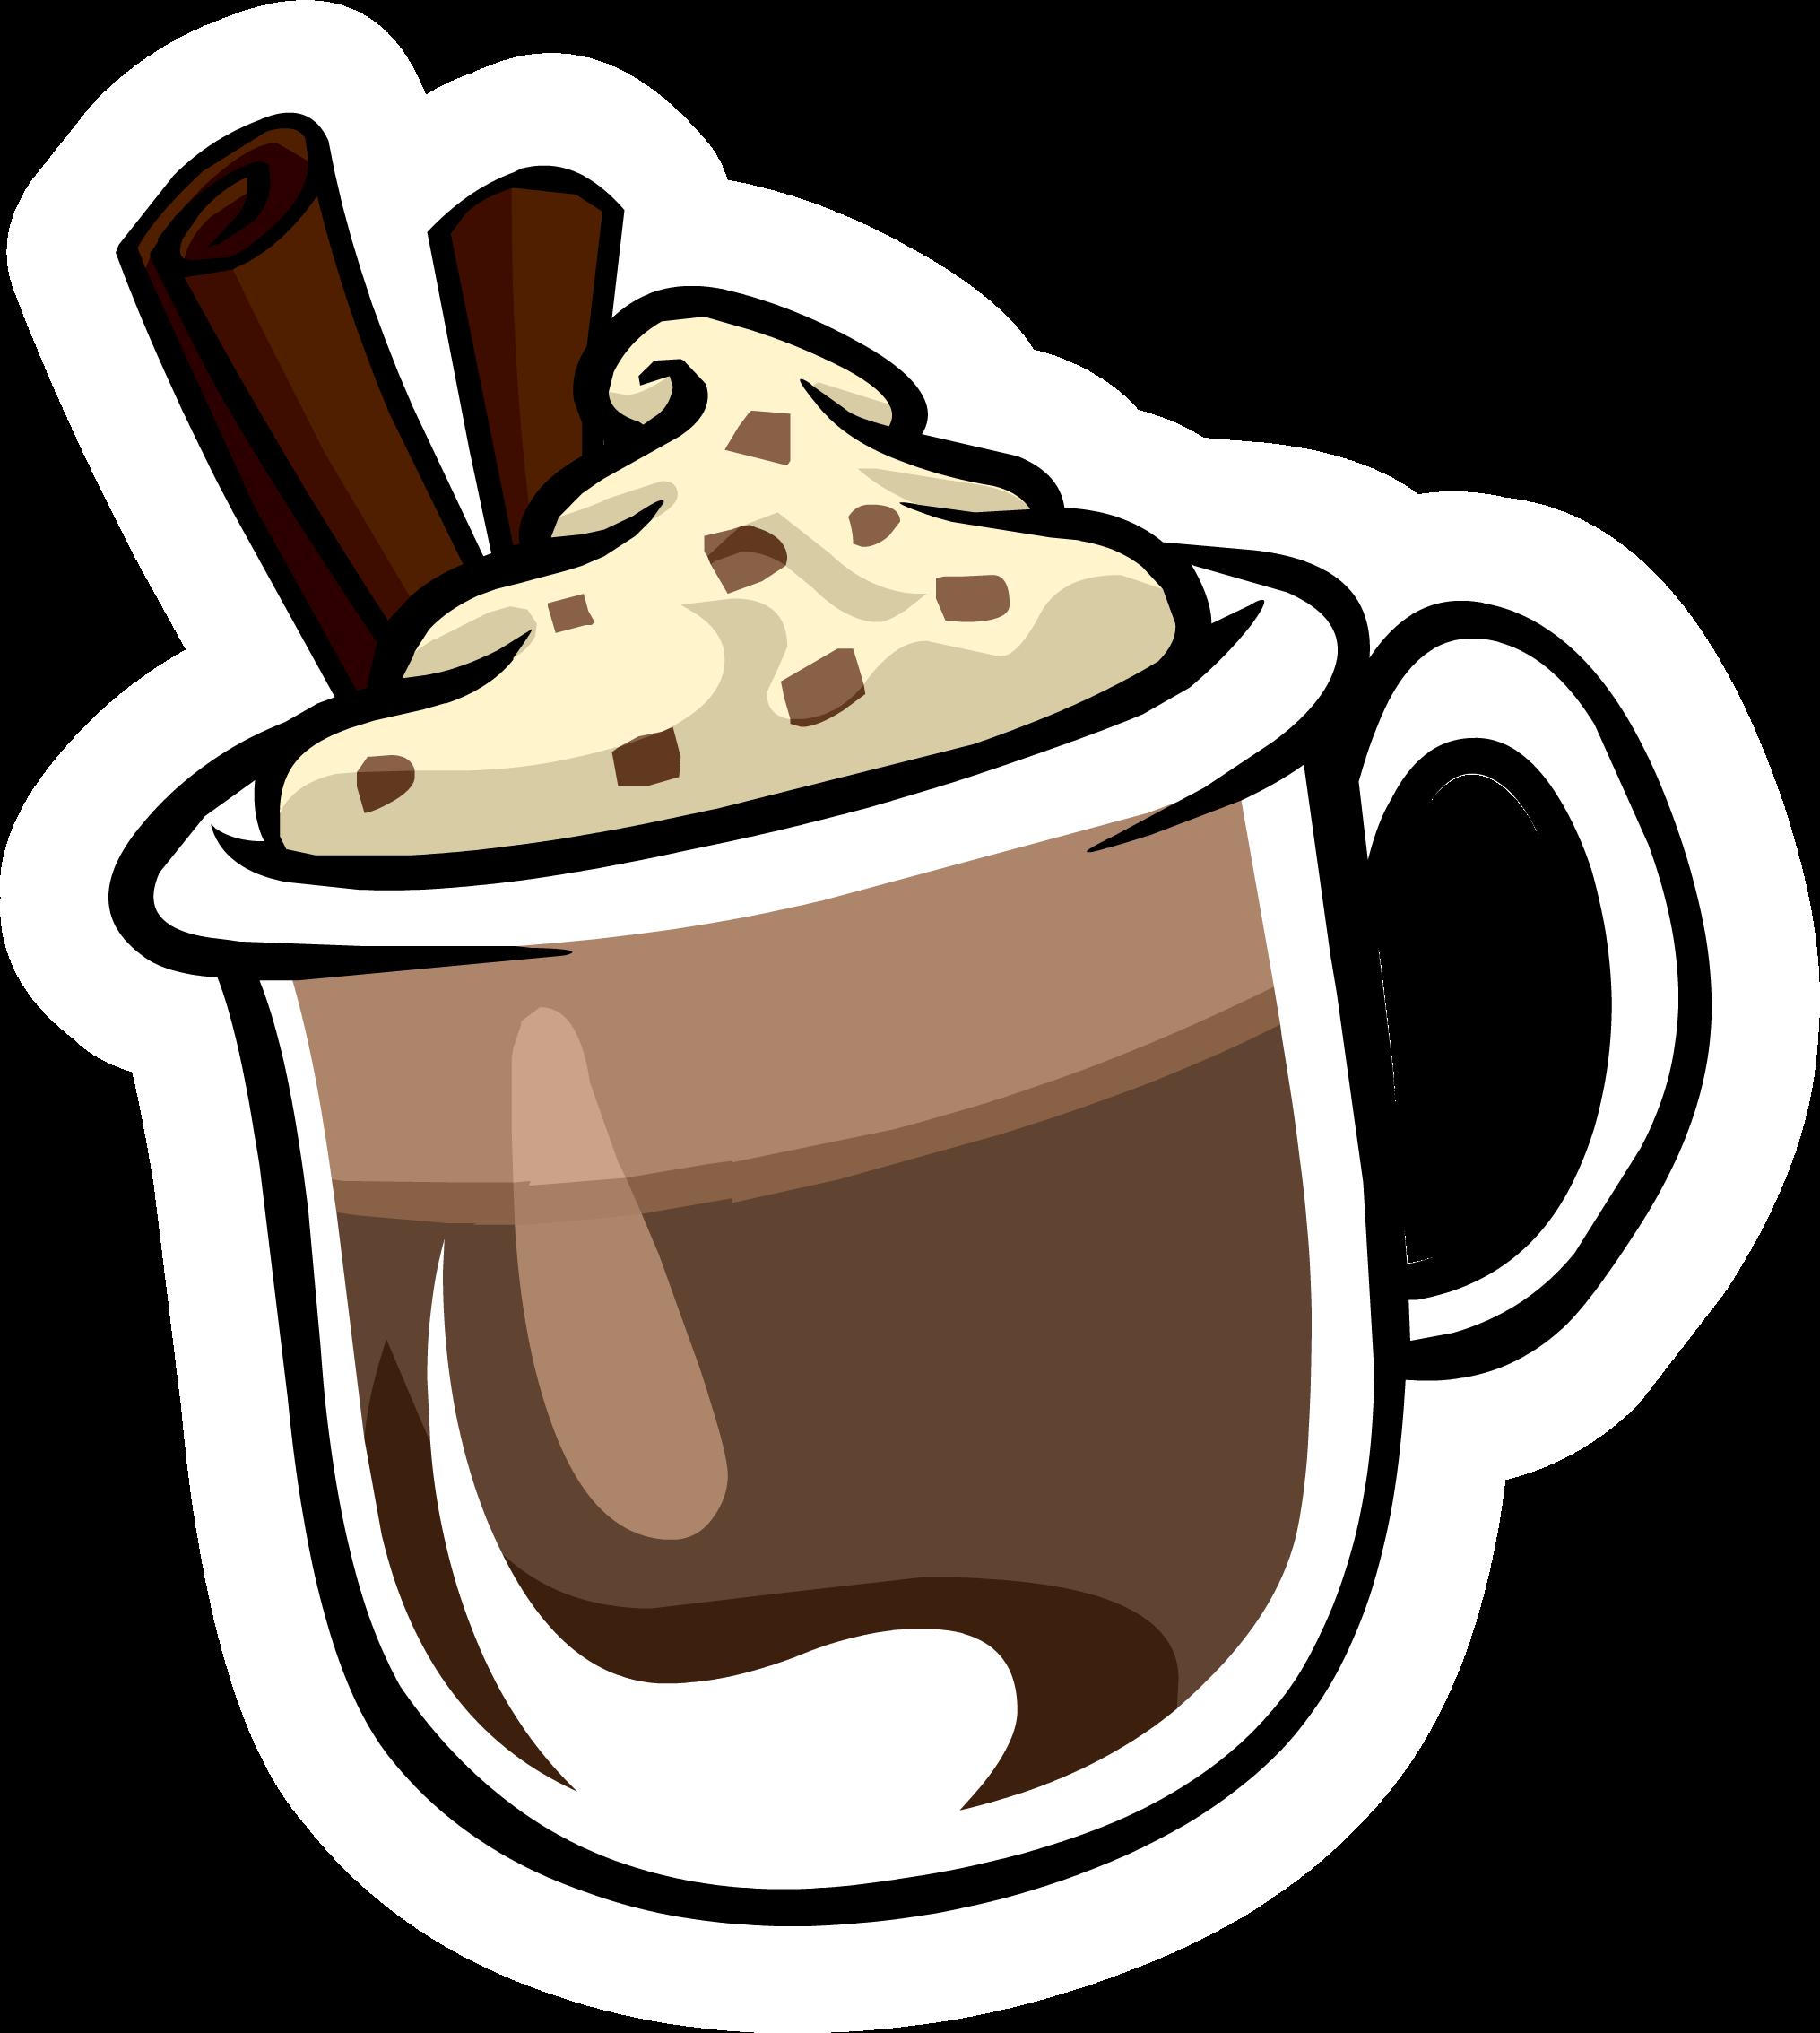 Marshmellow clipart hot chocolate Art Hot of Chocolate Clipart